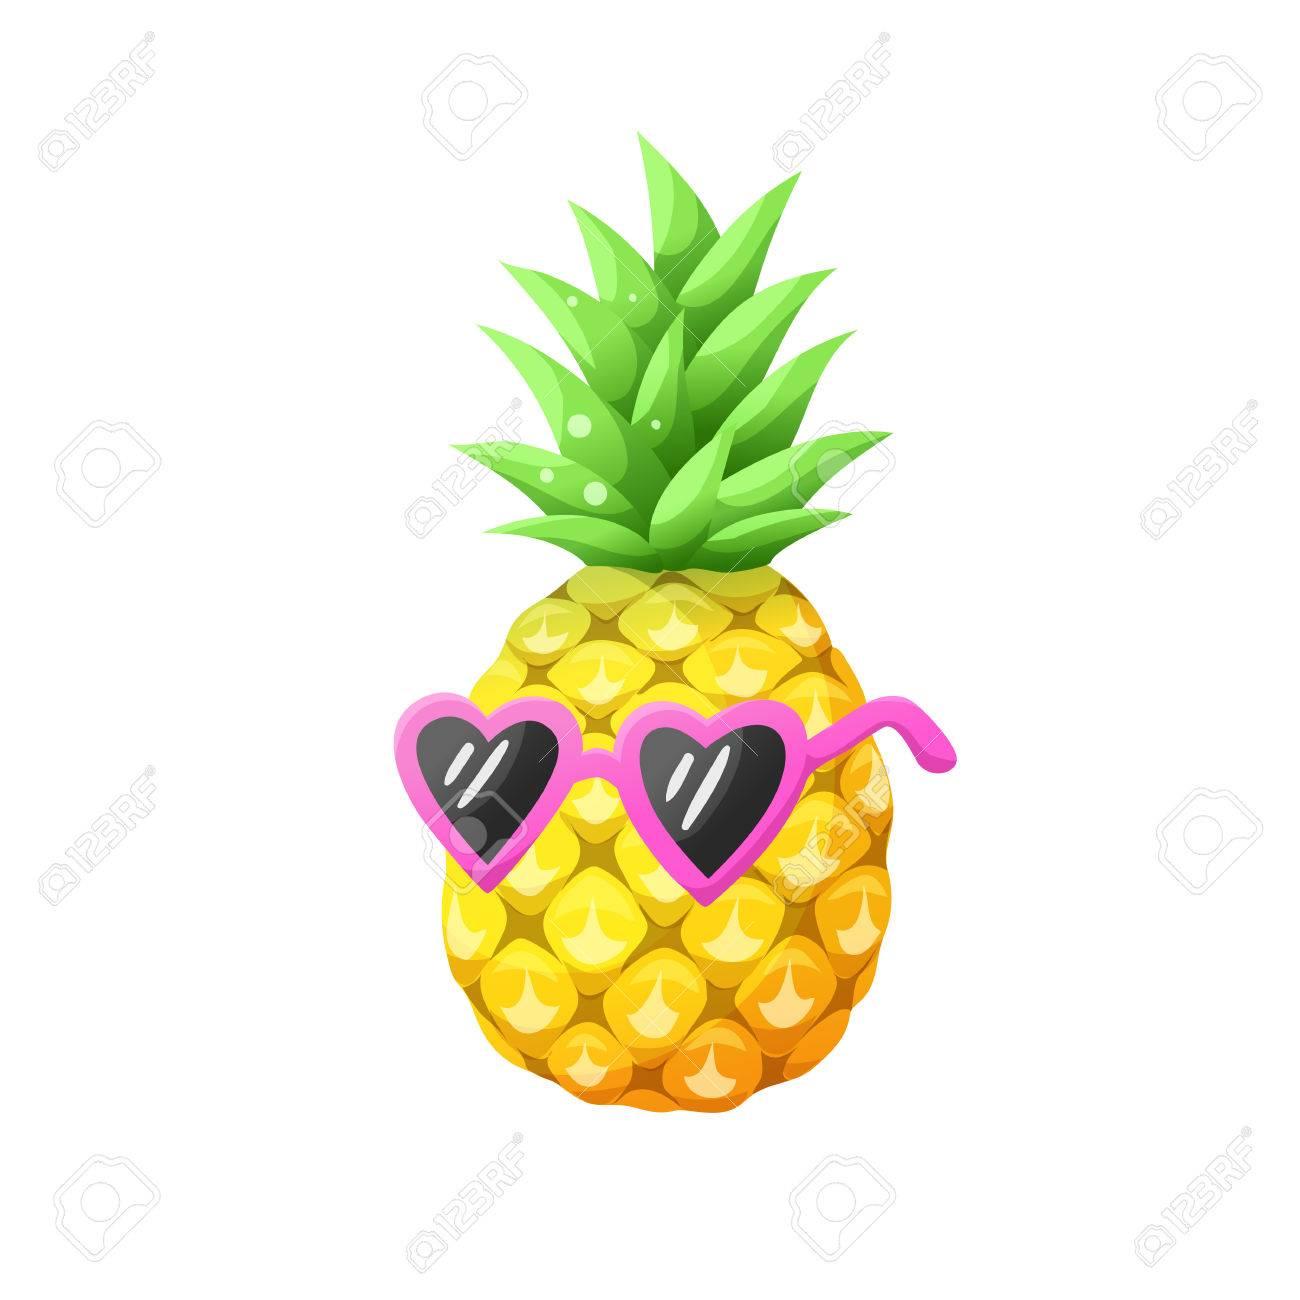 bright cartoon pineapple icon